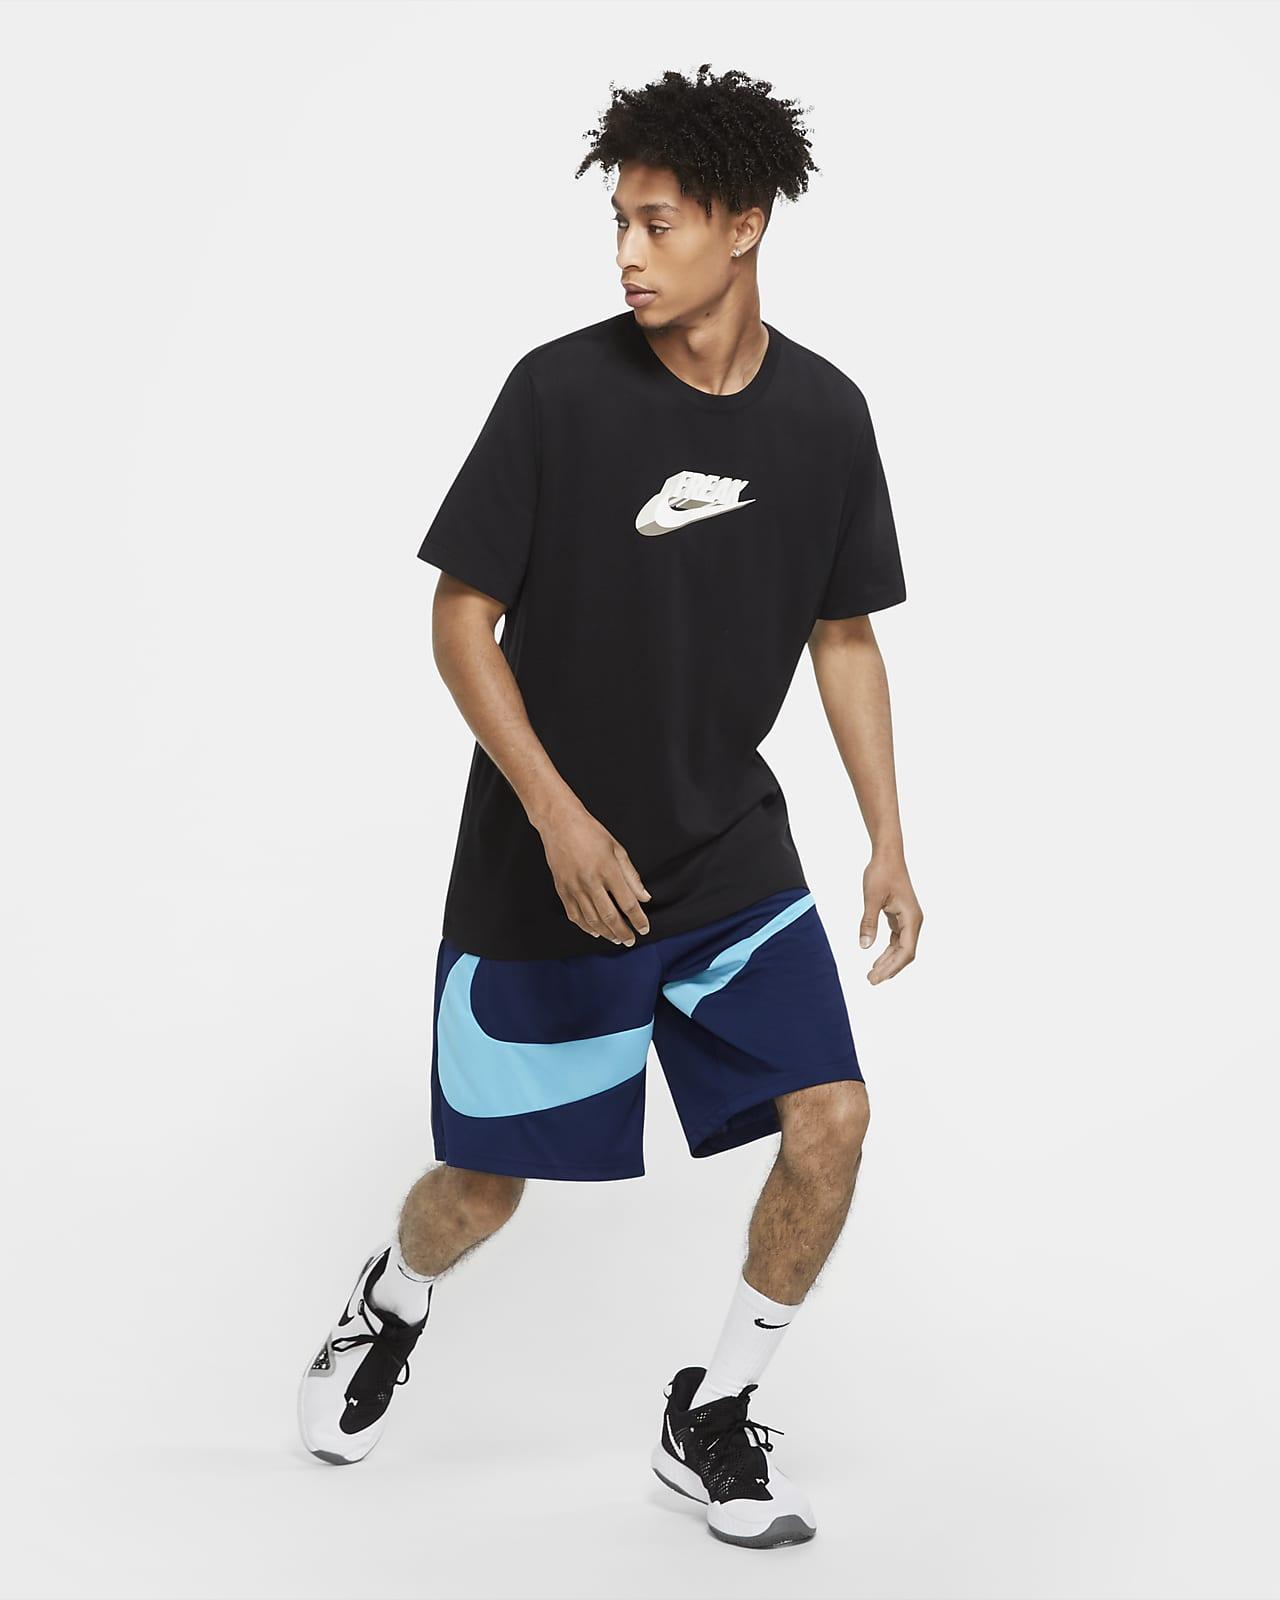 Giannis Swoosh Freak Nike Dri FIT T skjorte til herre. Nike NO